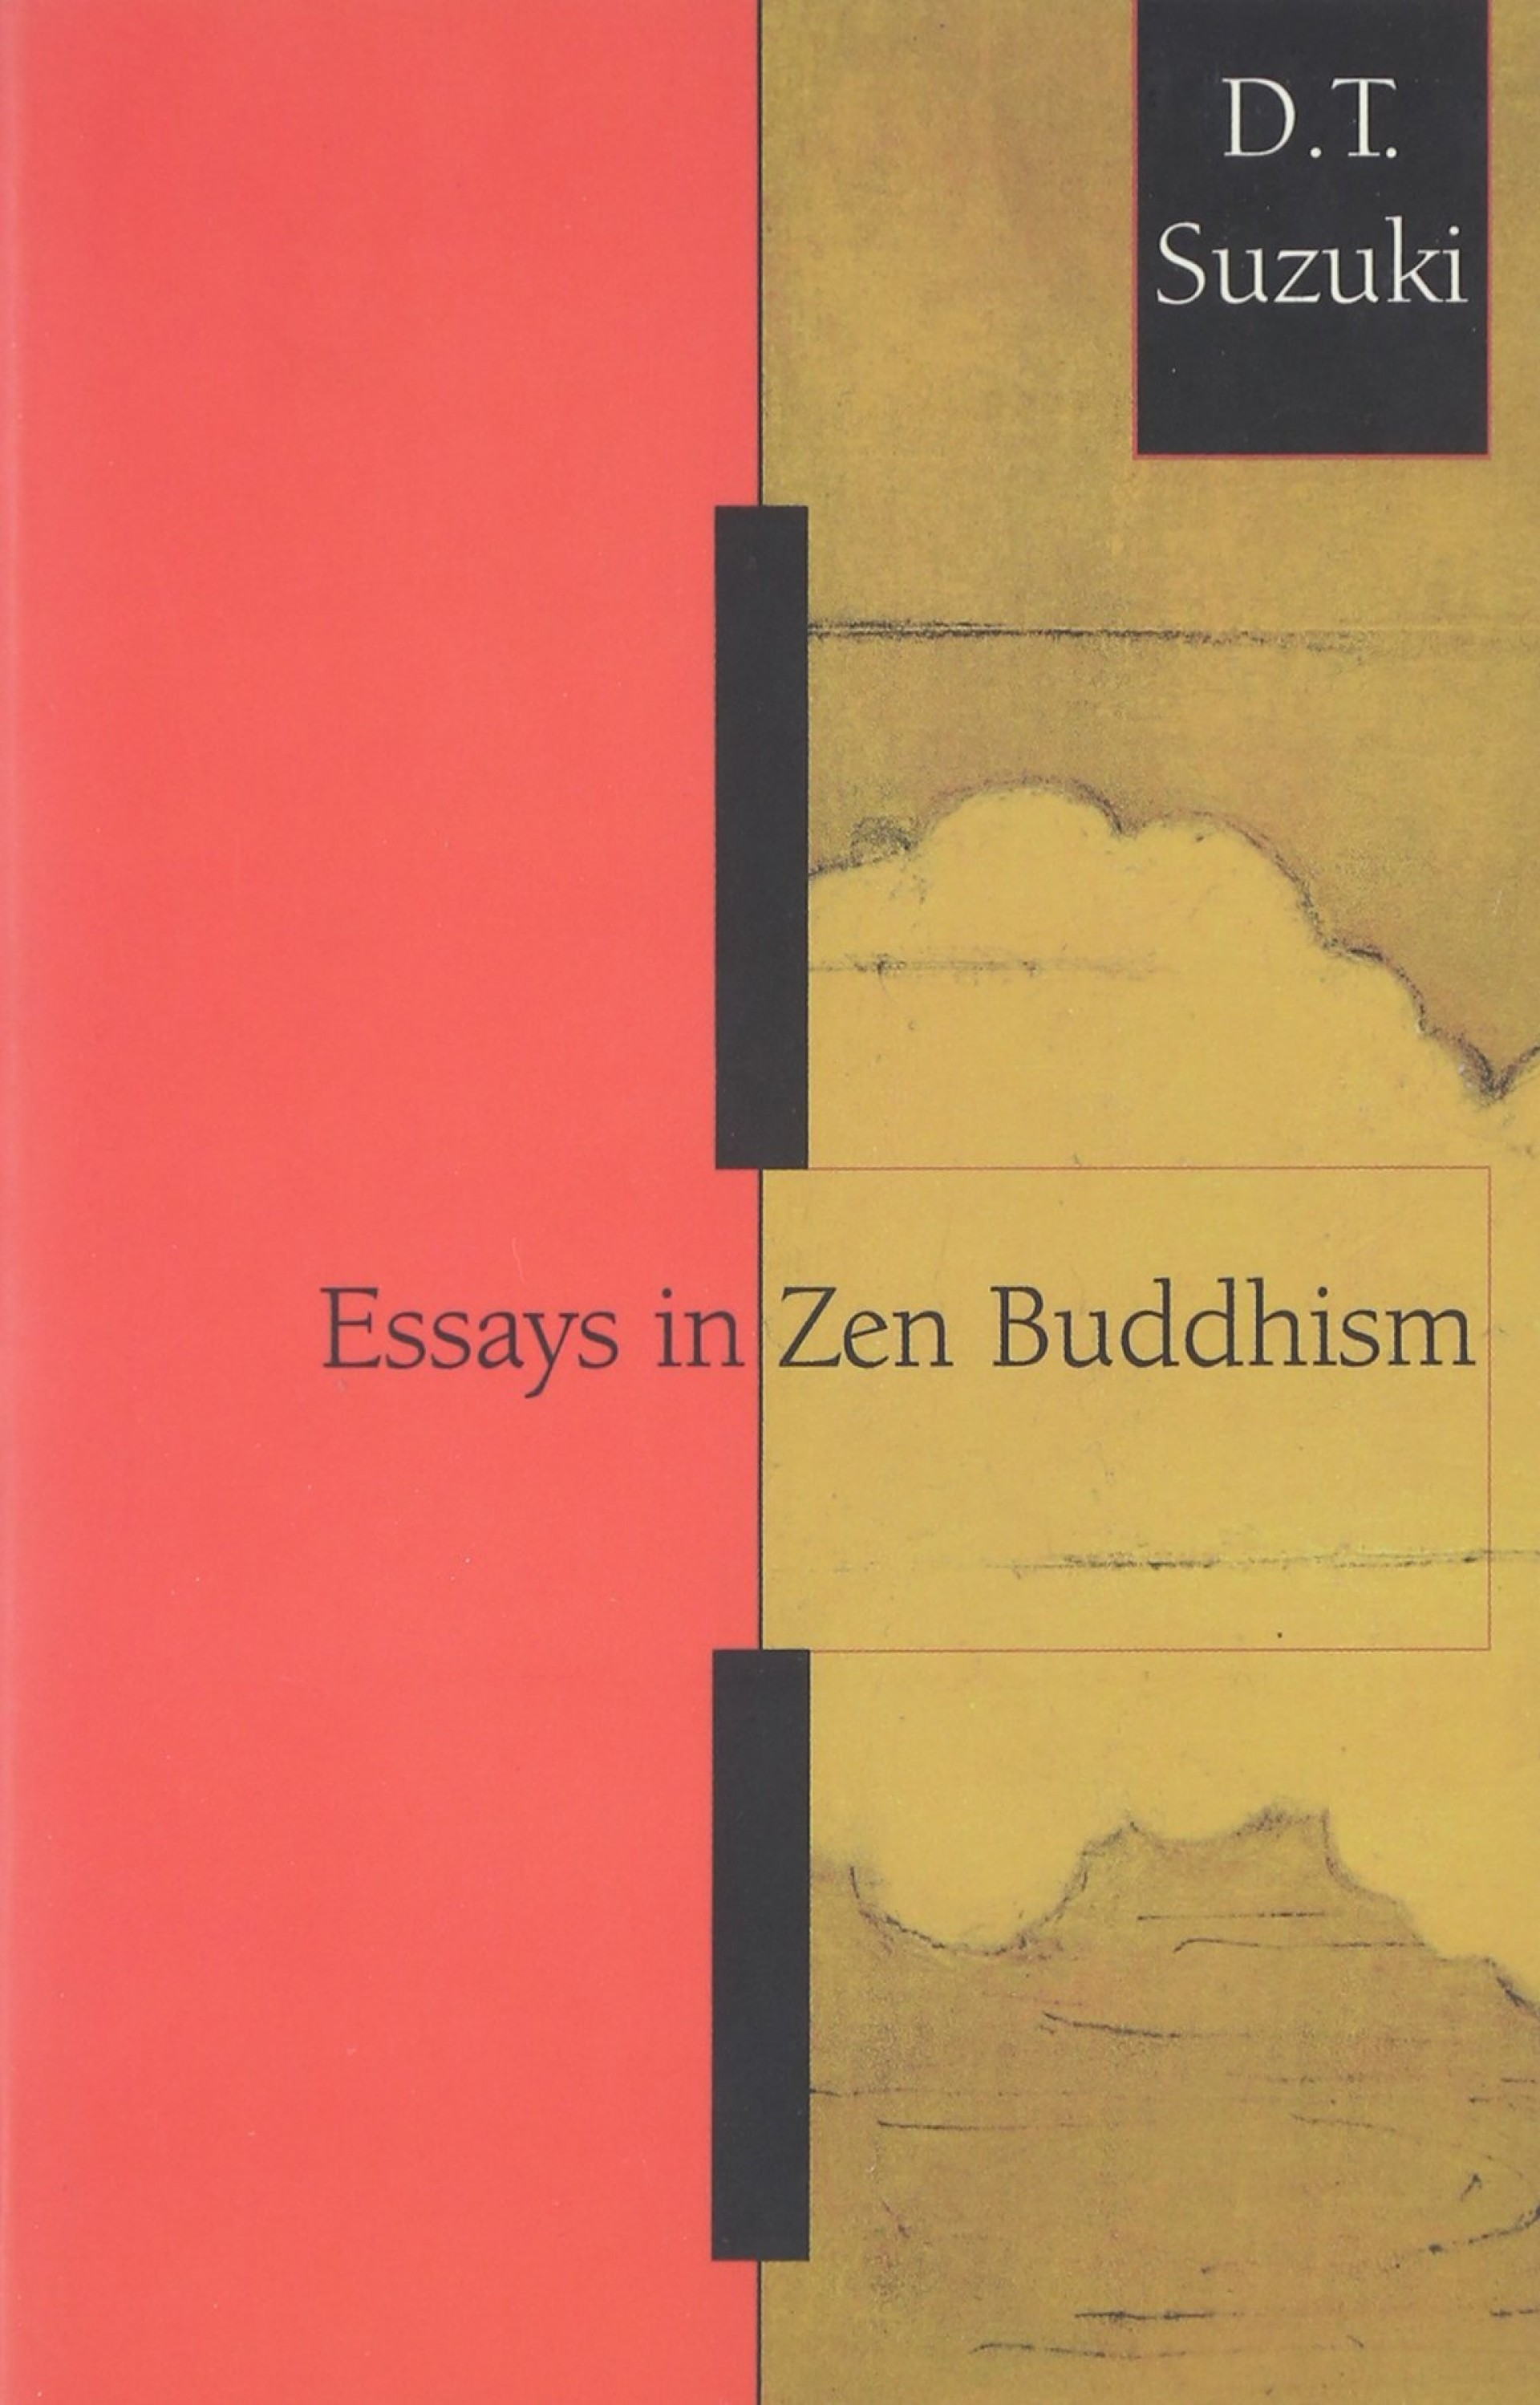 003 71cccelhvrl Essay Example Essays First Stunning Series In Zen Buddhism Emerson's Value 1920